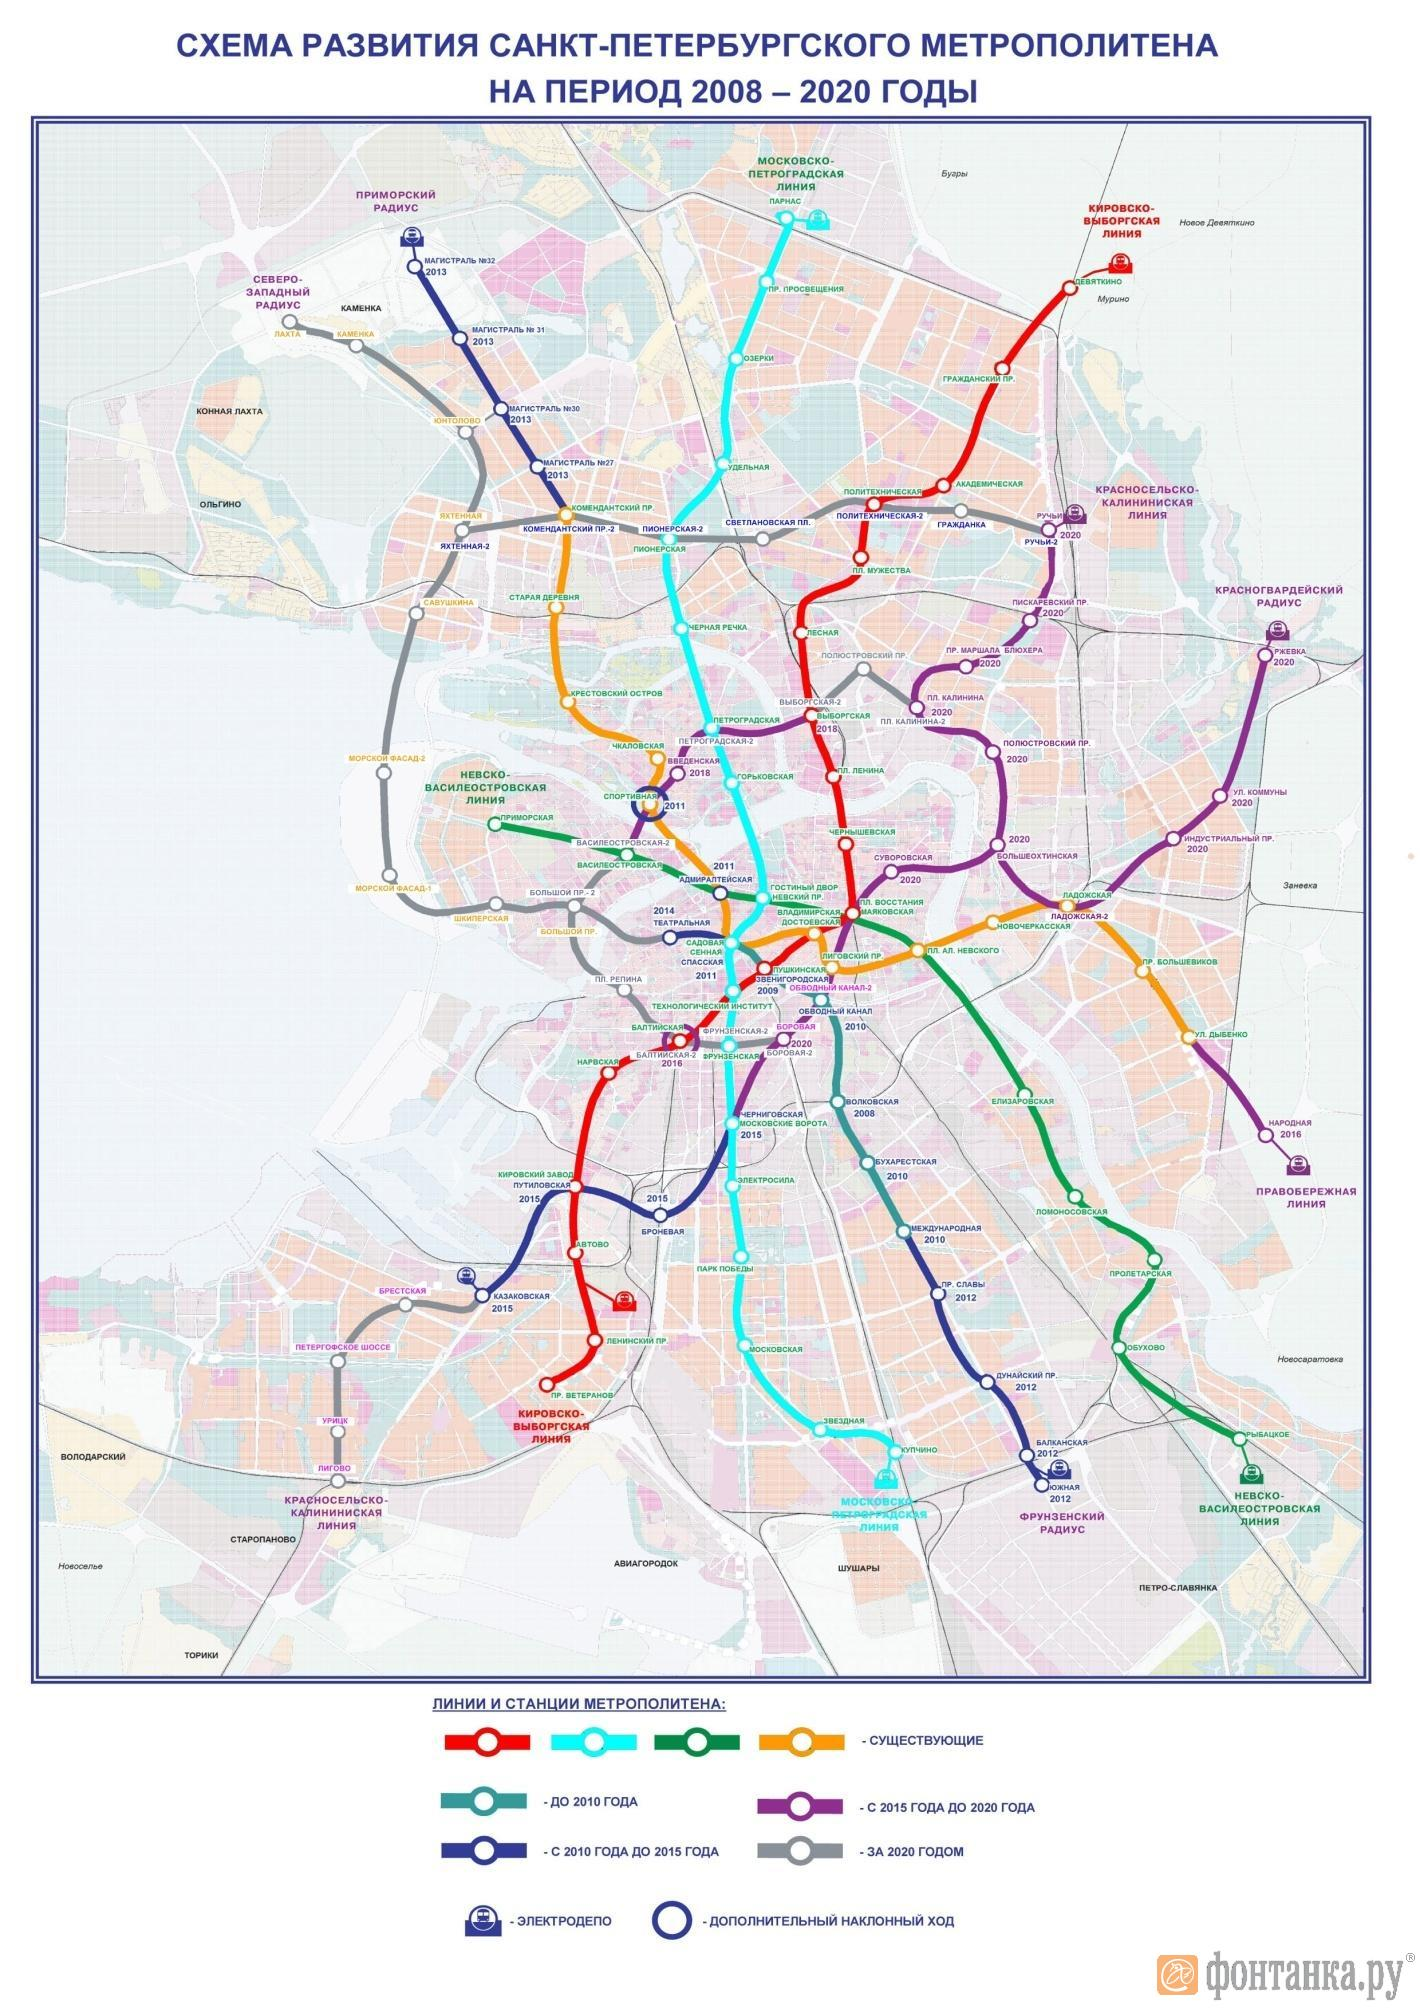 Схема развития петербургского метрополитена до 2020 года